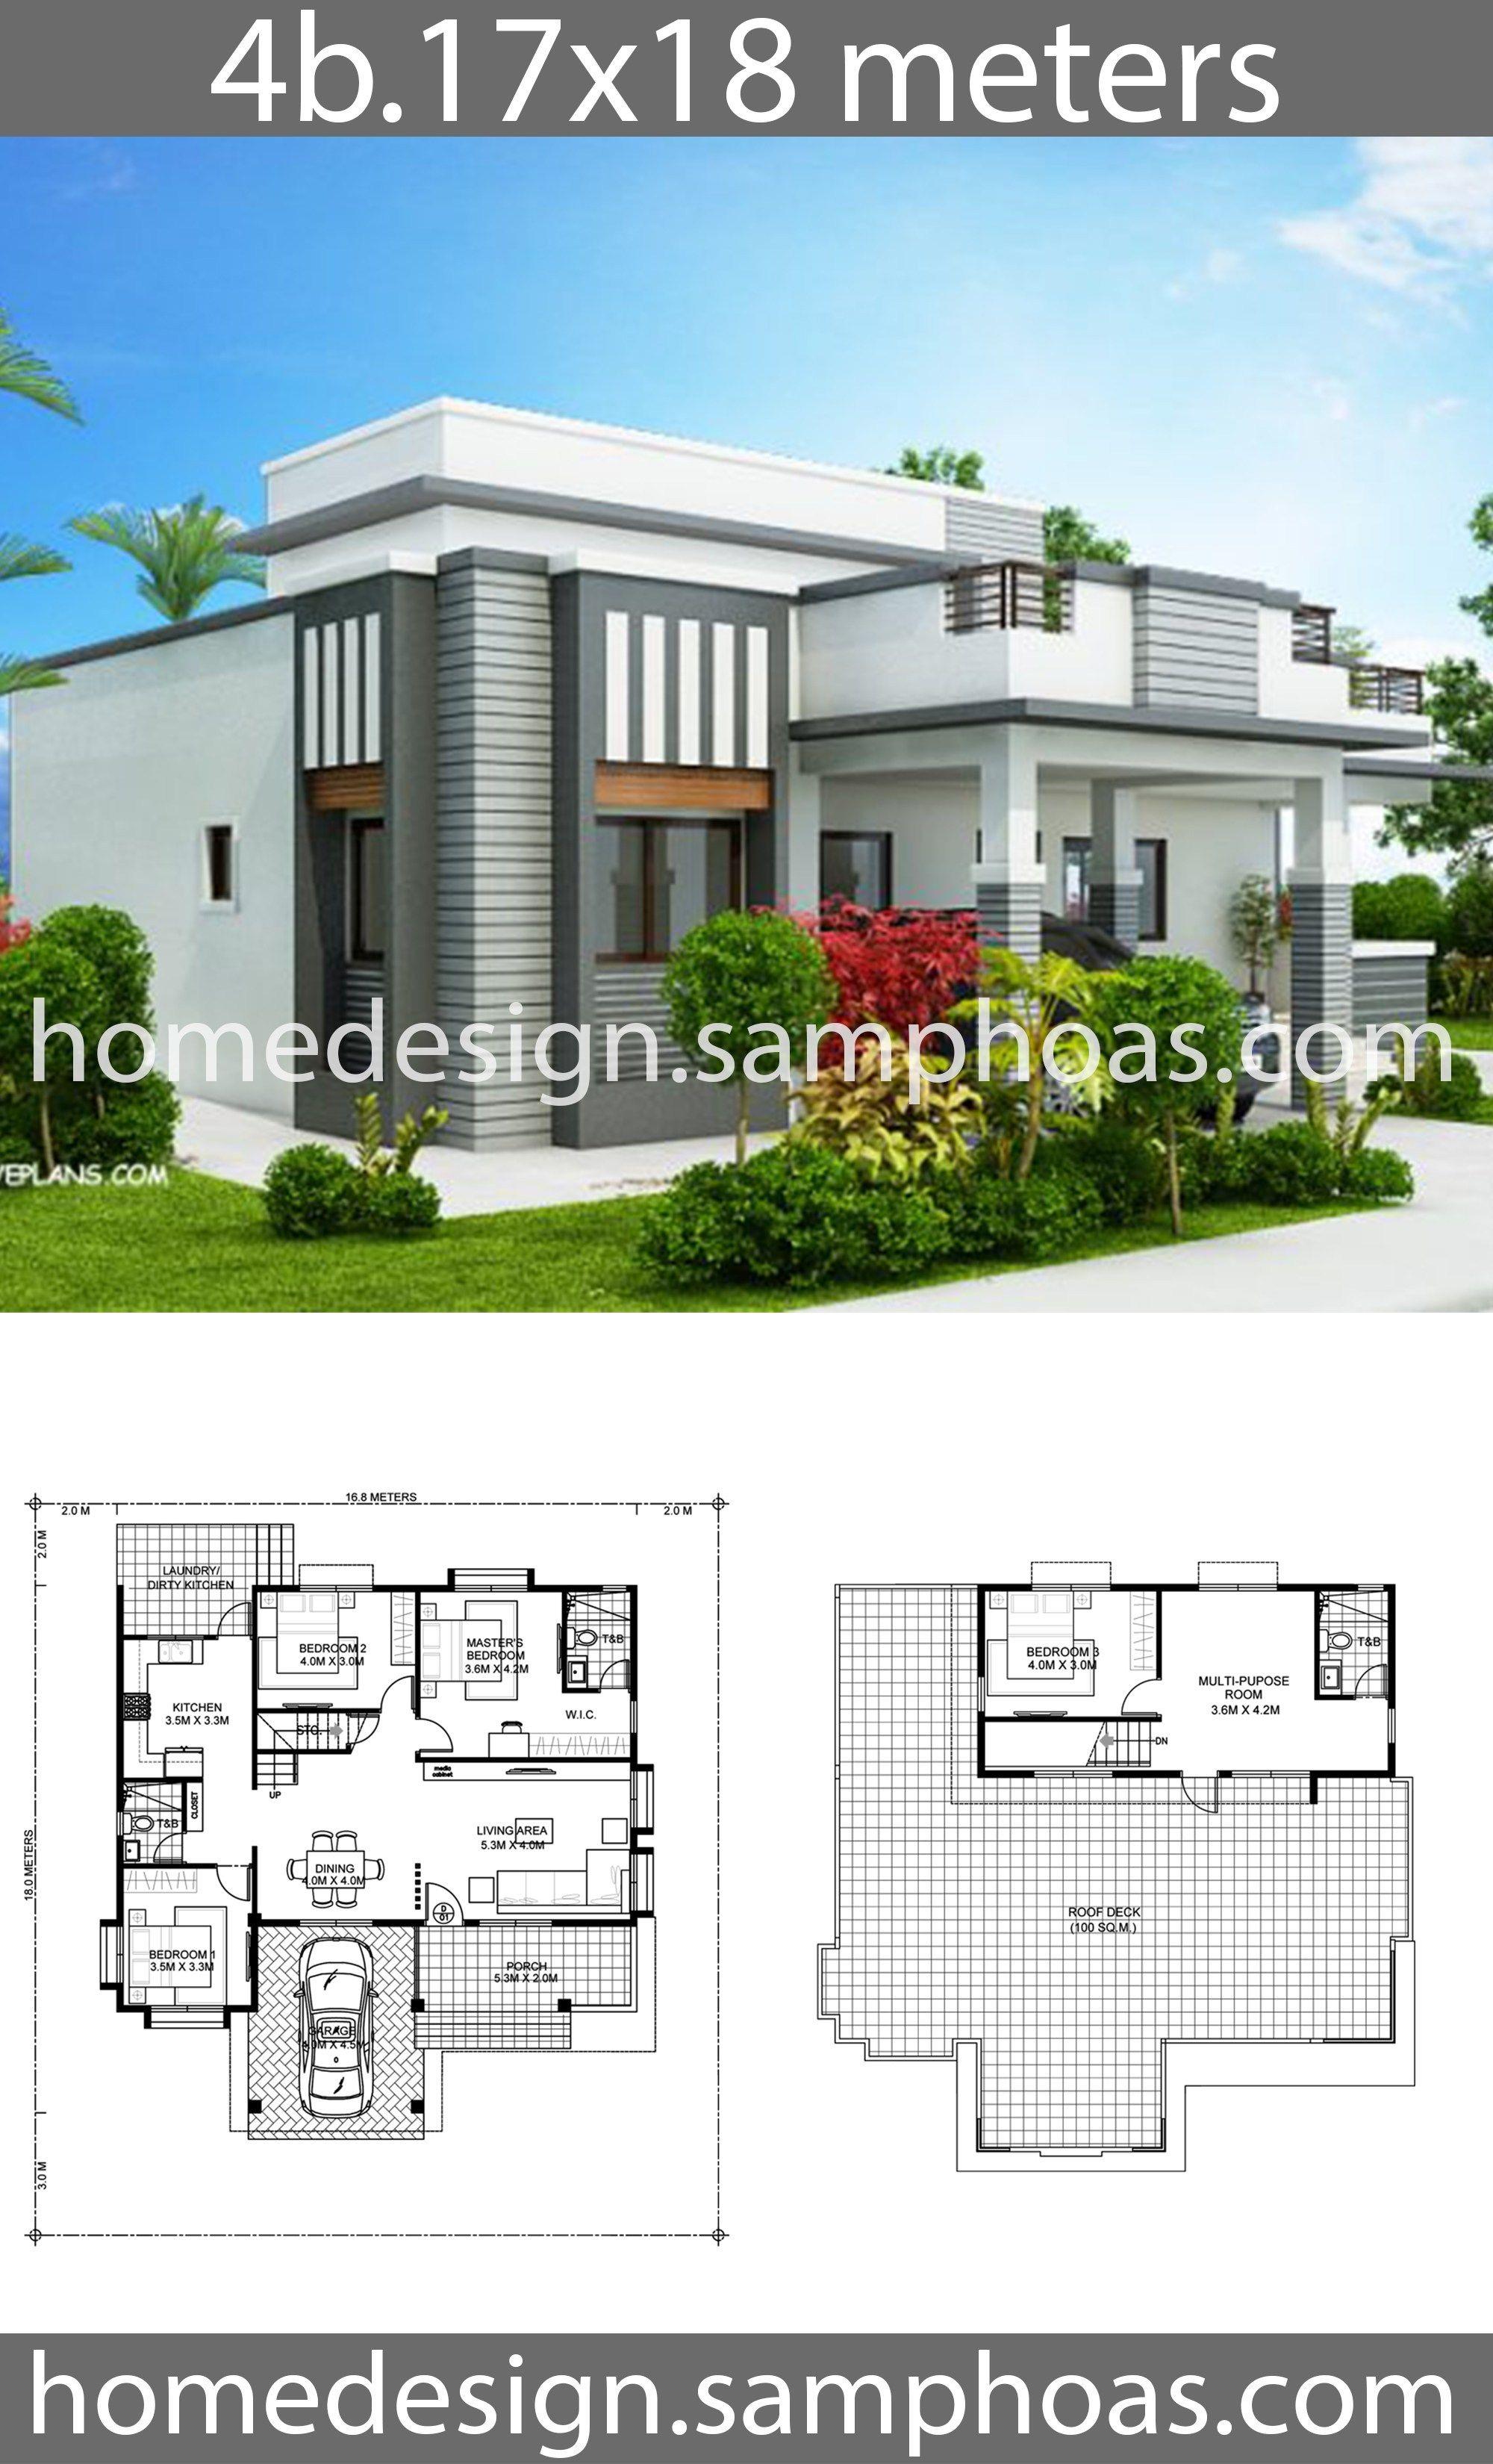 House Plans 17x18m With 4 Bedroom Style Modern Terrace Slaphouse Description Ground Level 3 Bedroo Beautiful House Plans Model House Plan House Plans Mansion